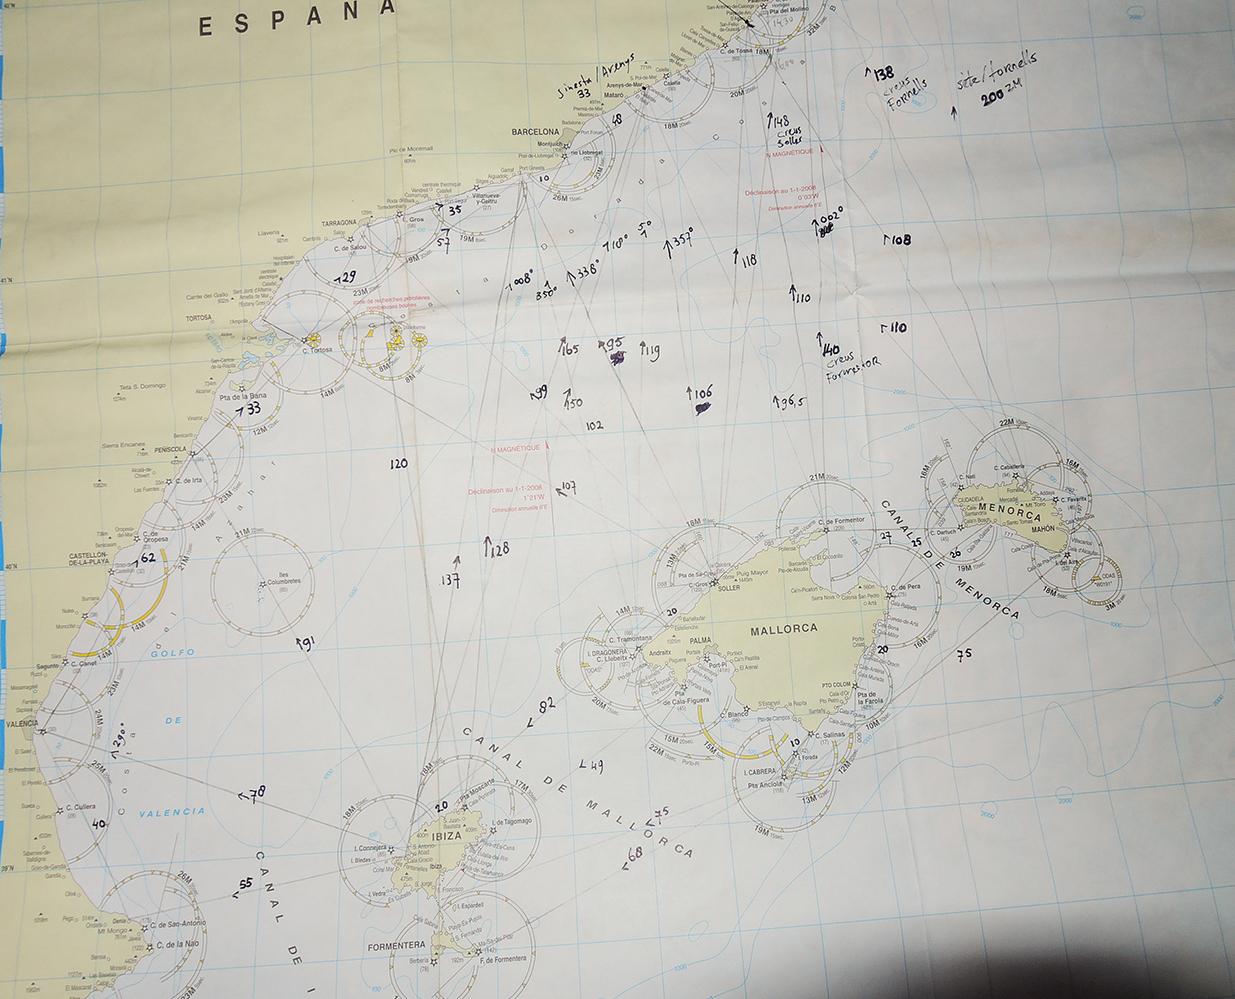 Islas-Baleares-navigation-map